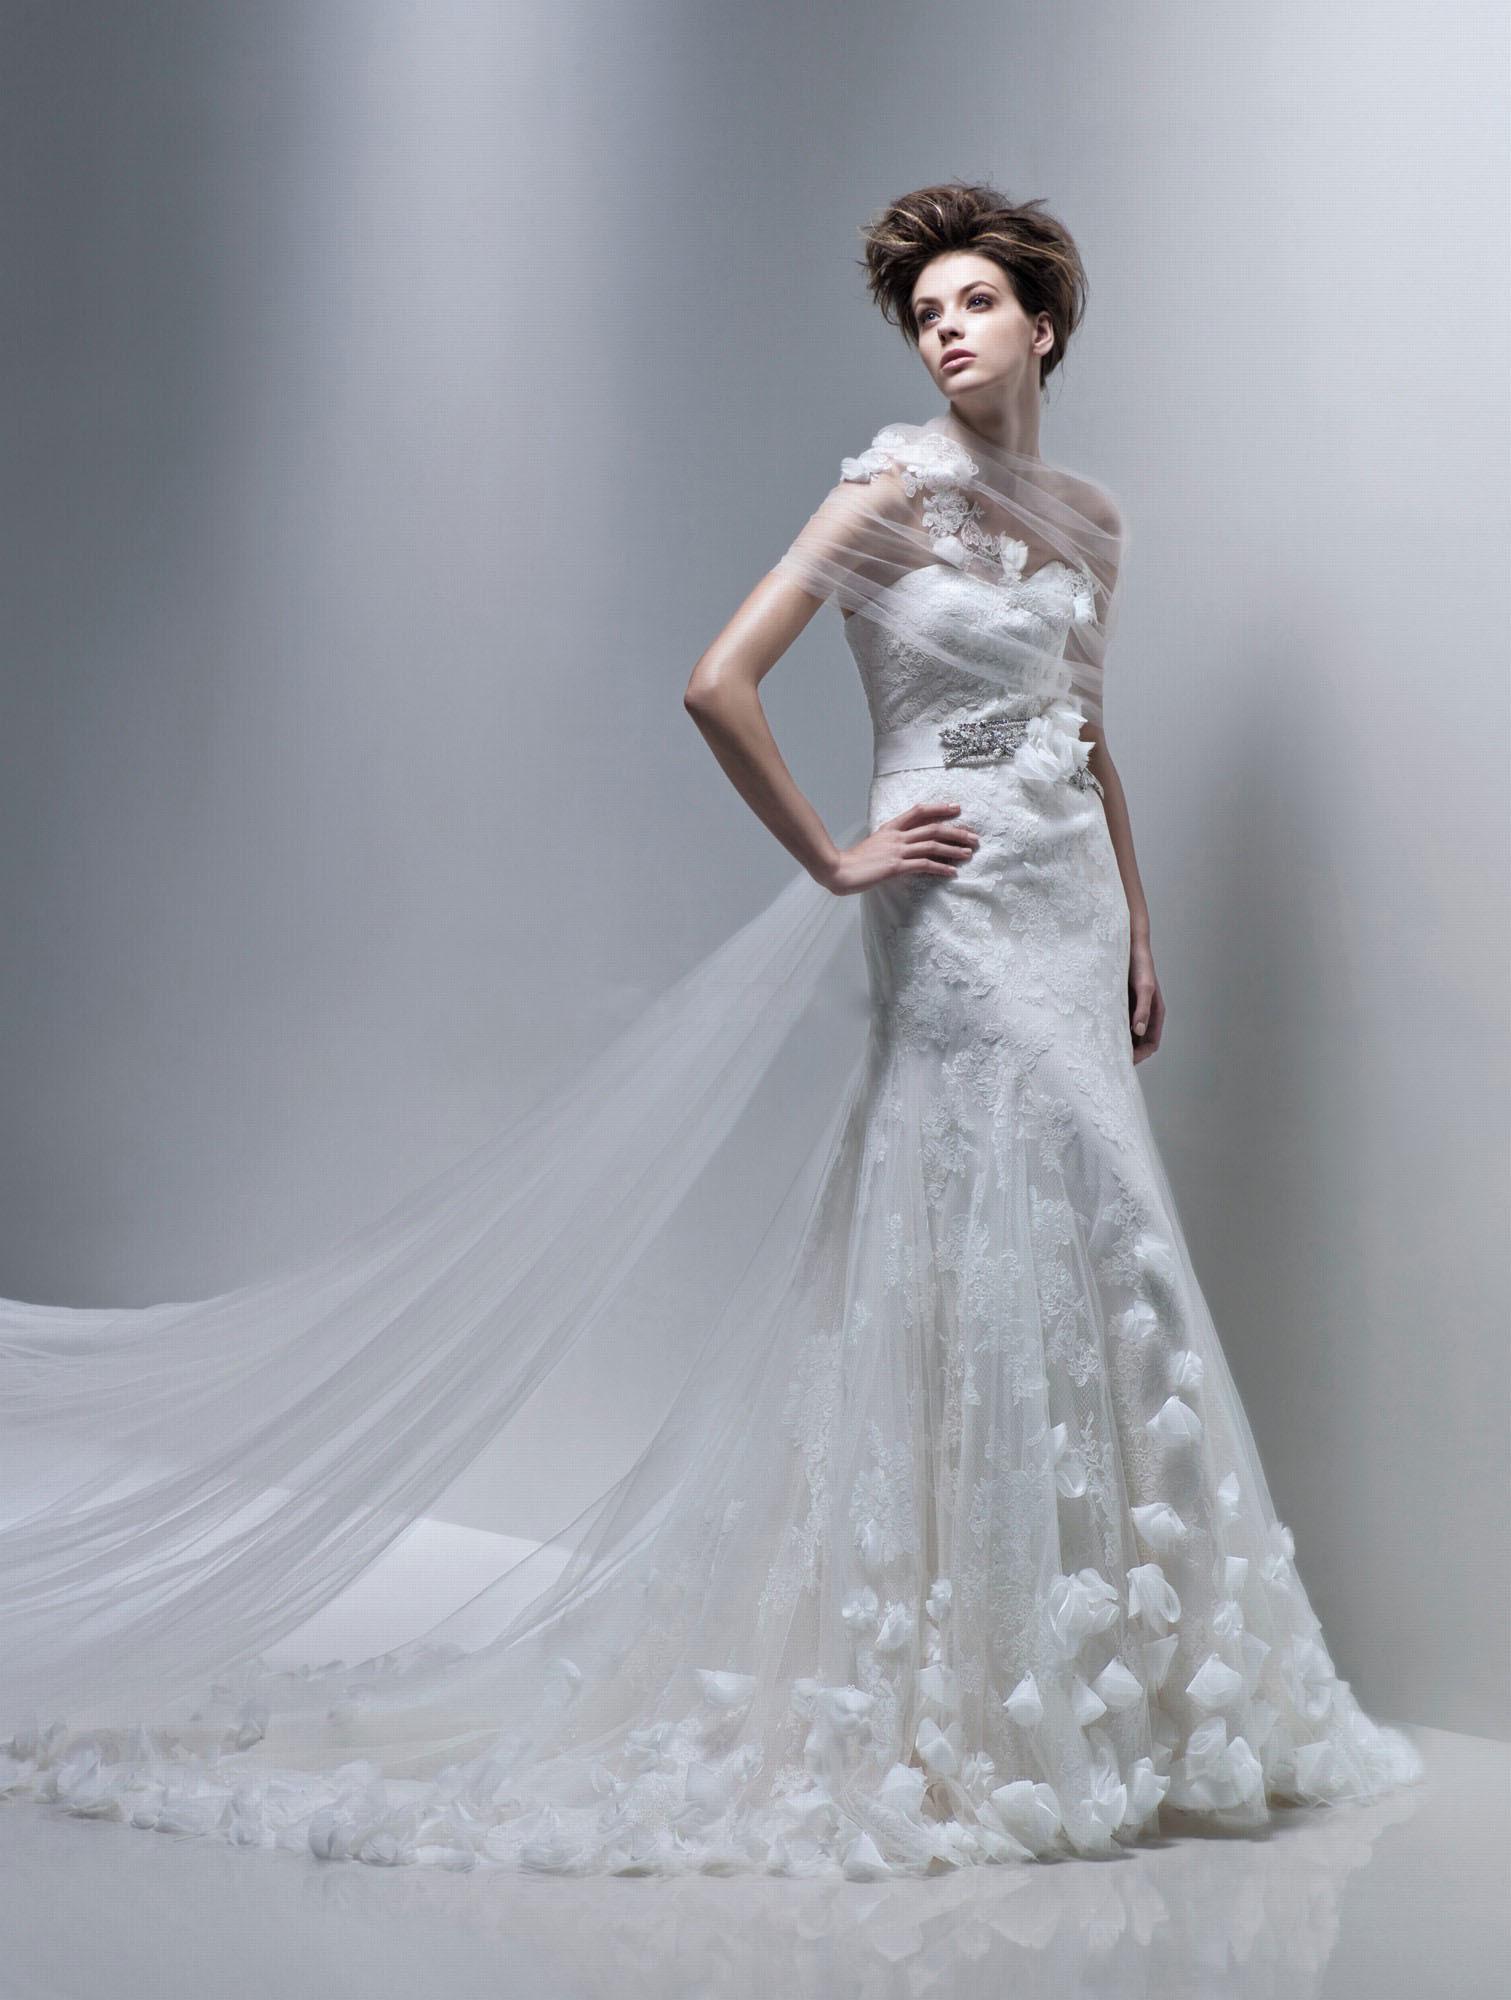 dresses fairy wedding elvish wedding dress Dresses Fairy Wedding 54